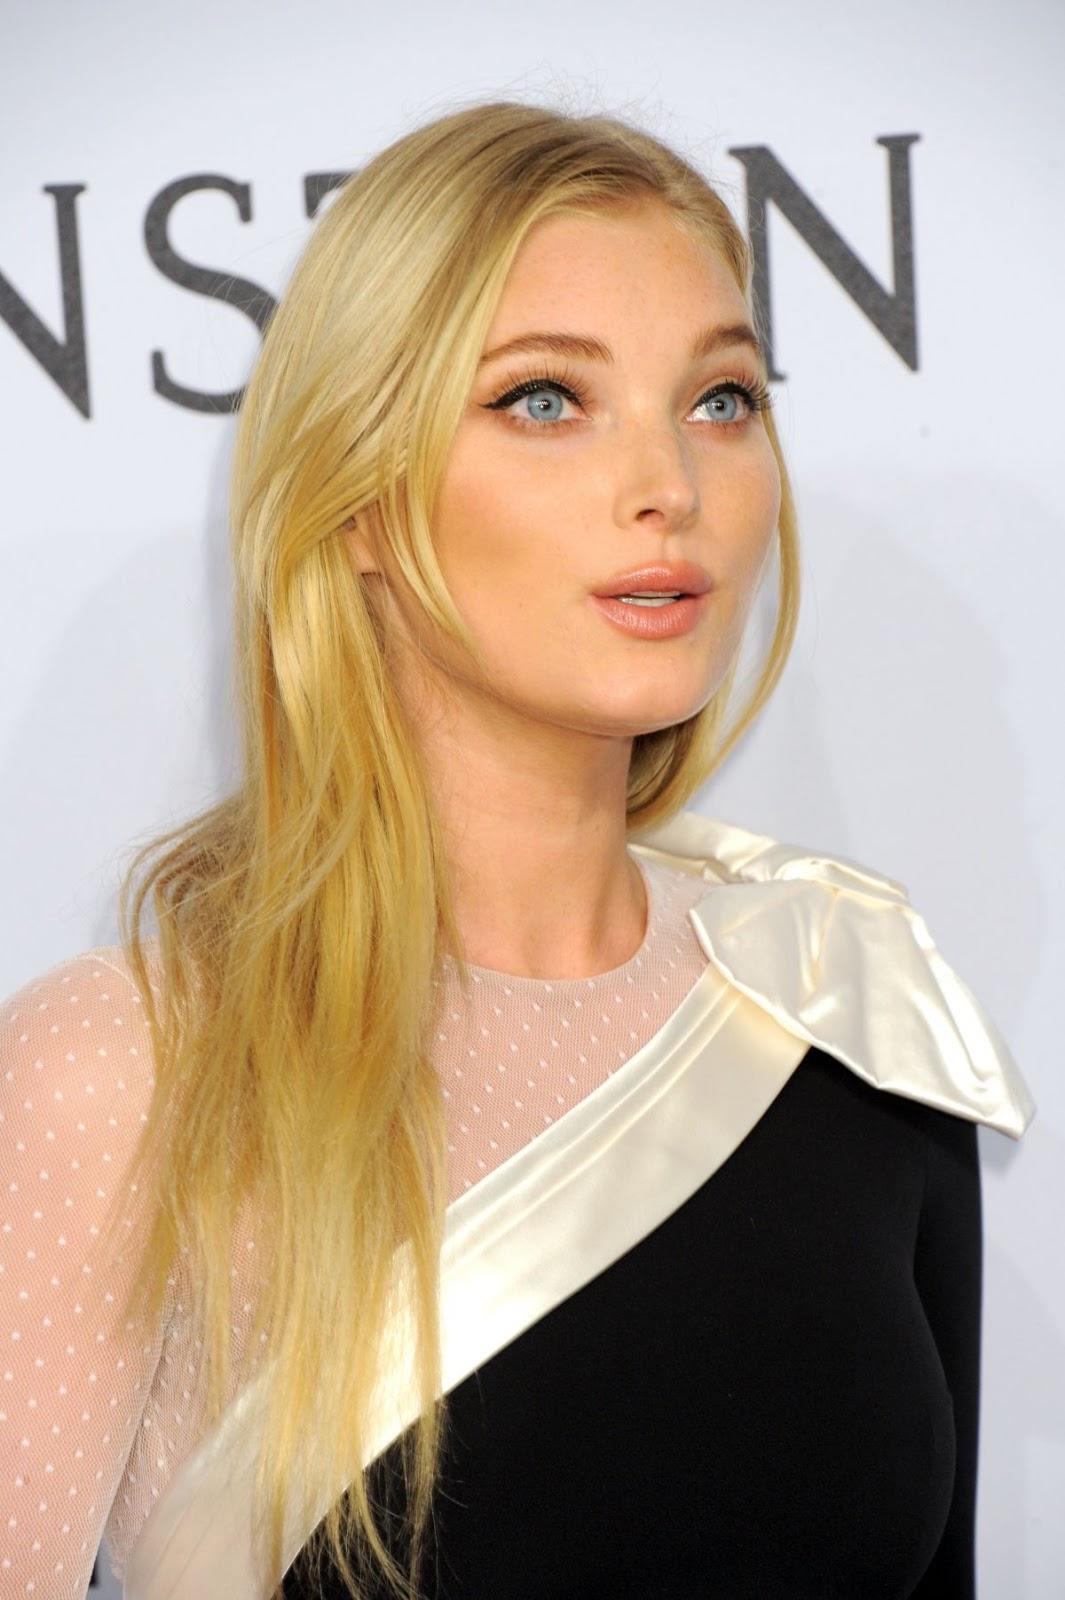 Victoria's Secret Supermodel Elsa Hosk at 2016 amfAR New York Gala